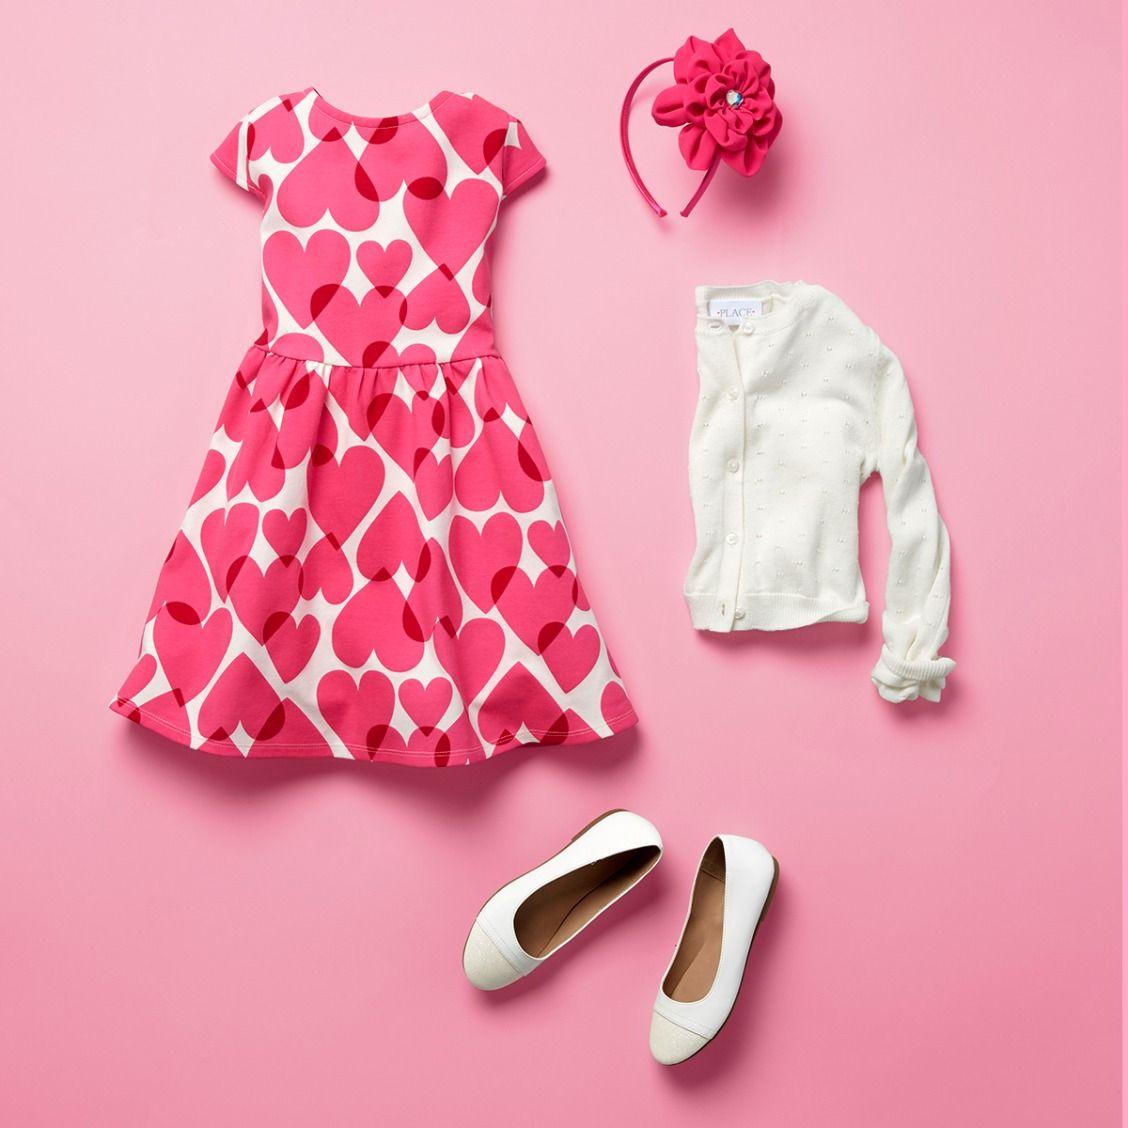 Pink dress emoji  Queen of hearts crown emoji heart emoji Get this look through